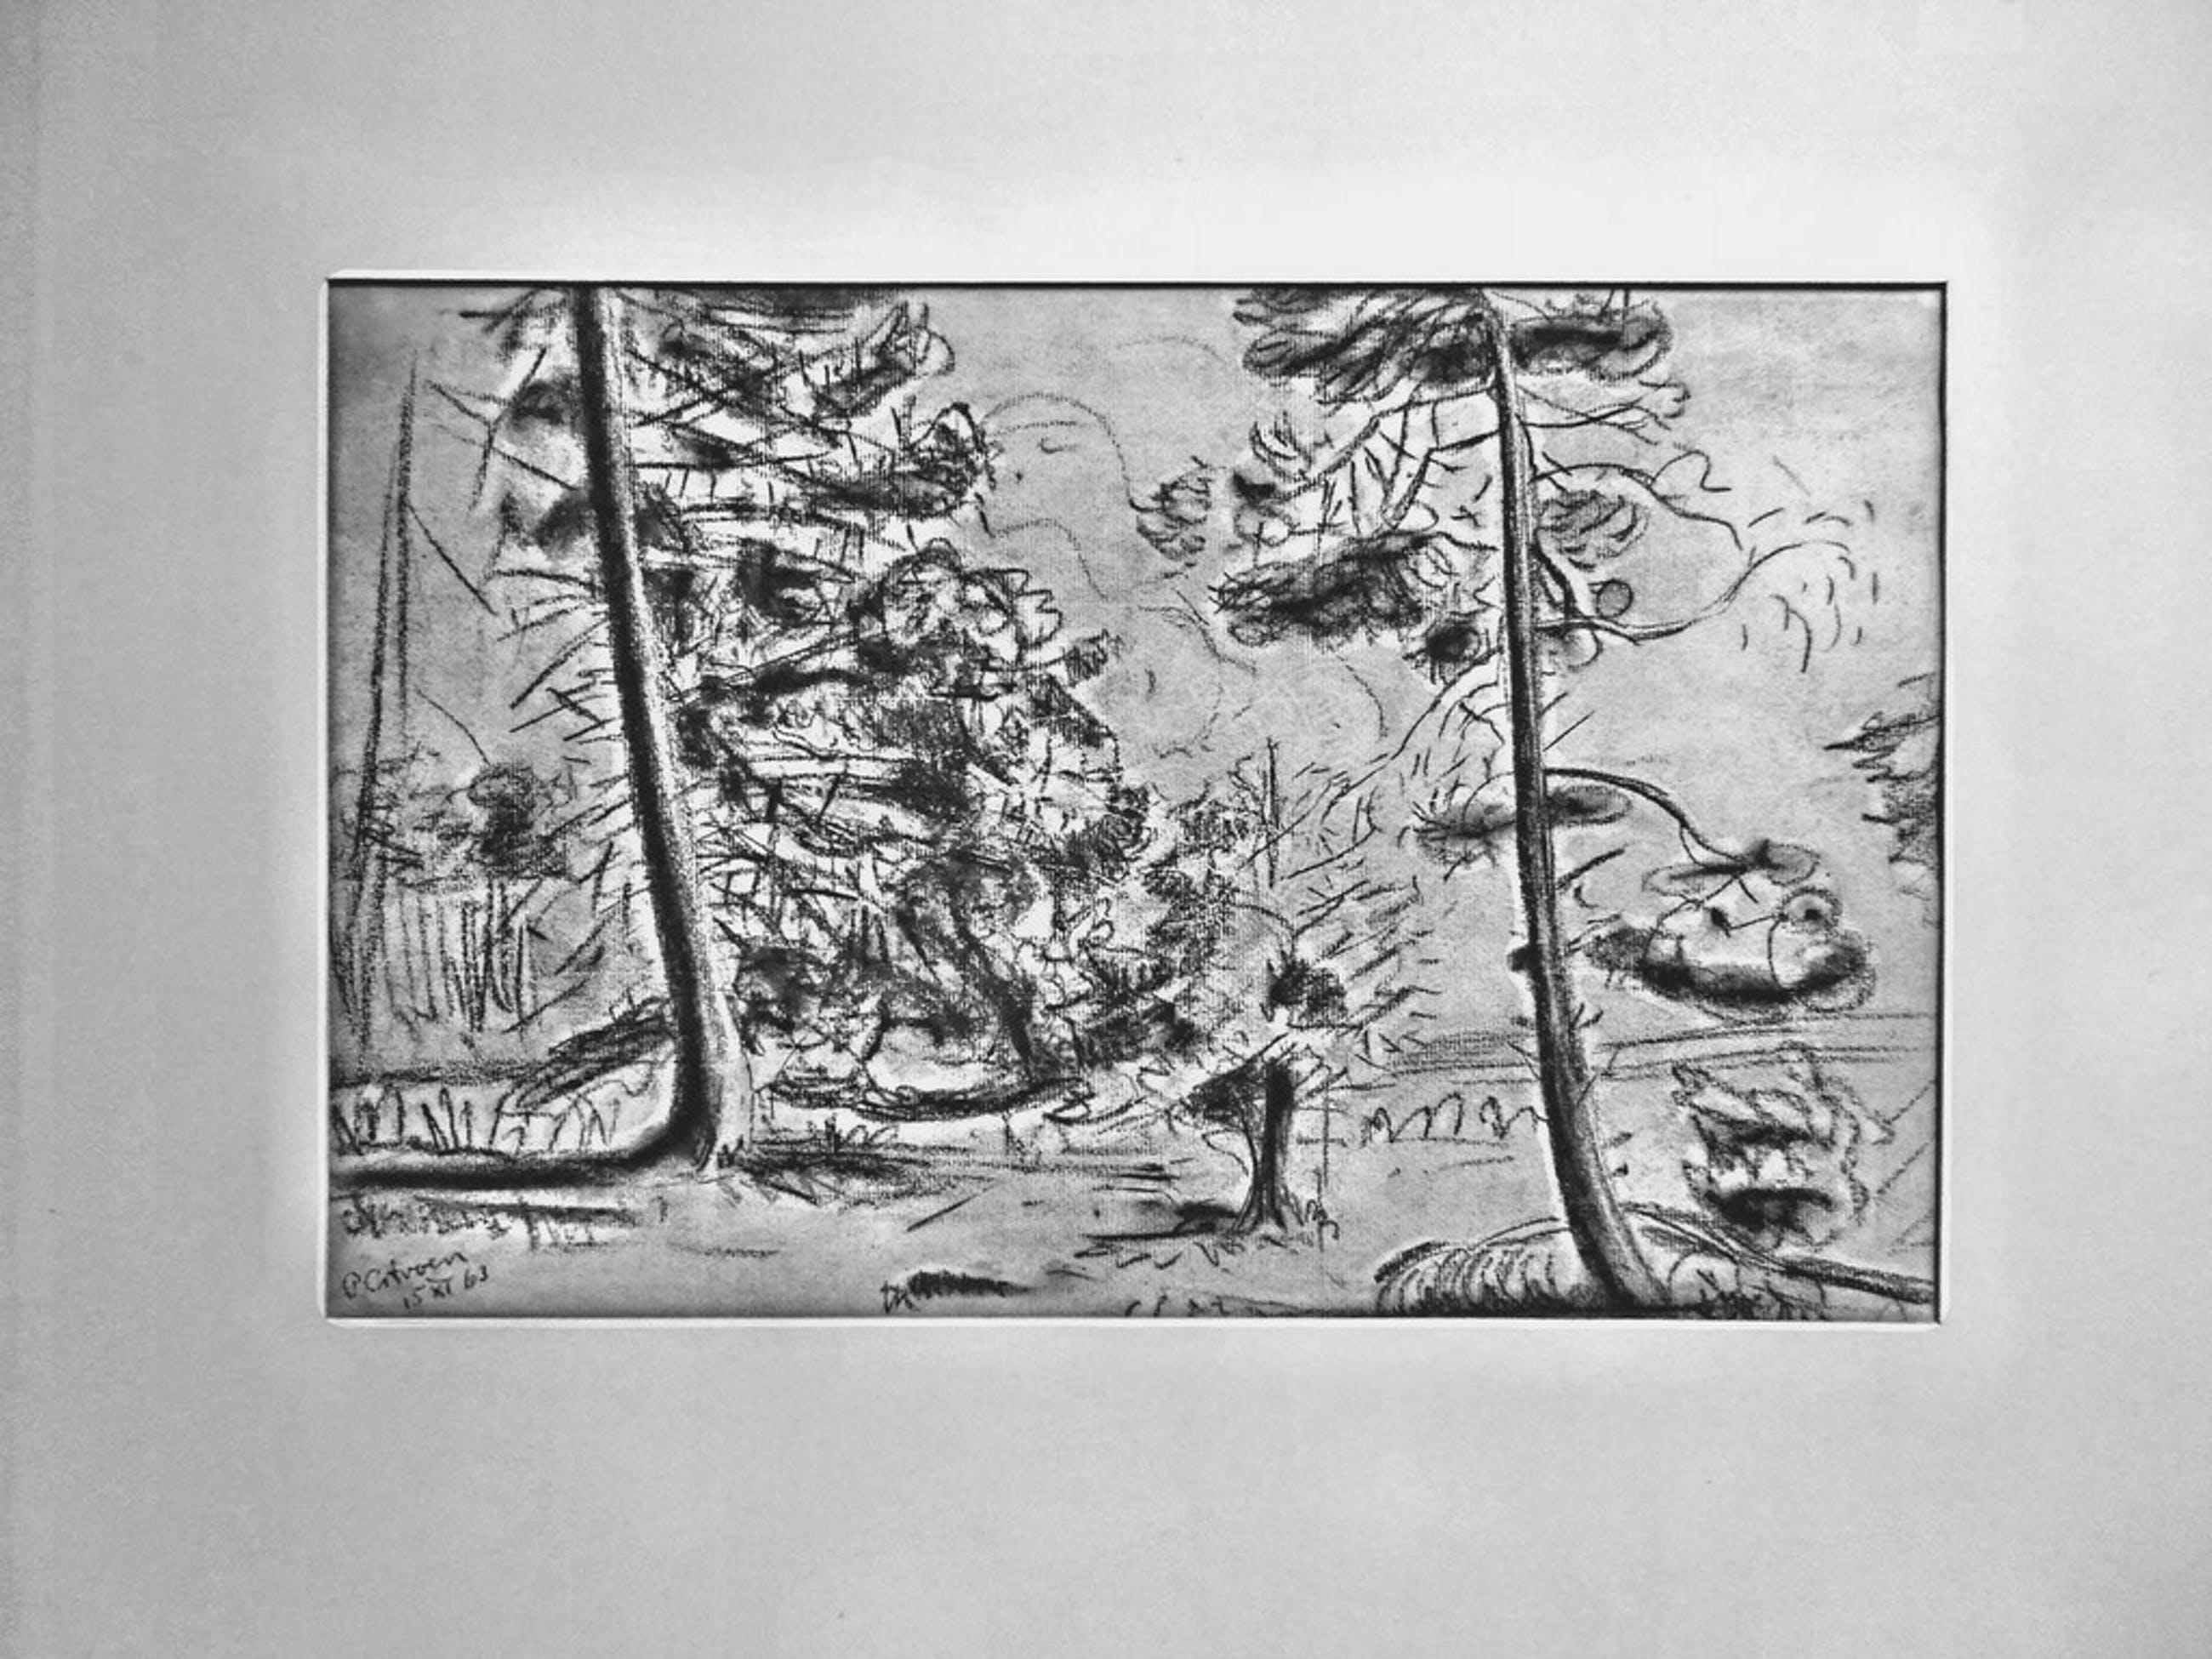 Paul Citroen Originele Houtskool/potlood tekening gesigneerd en gedateerd kopen? Bied vanaf 400!